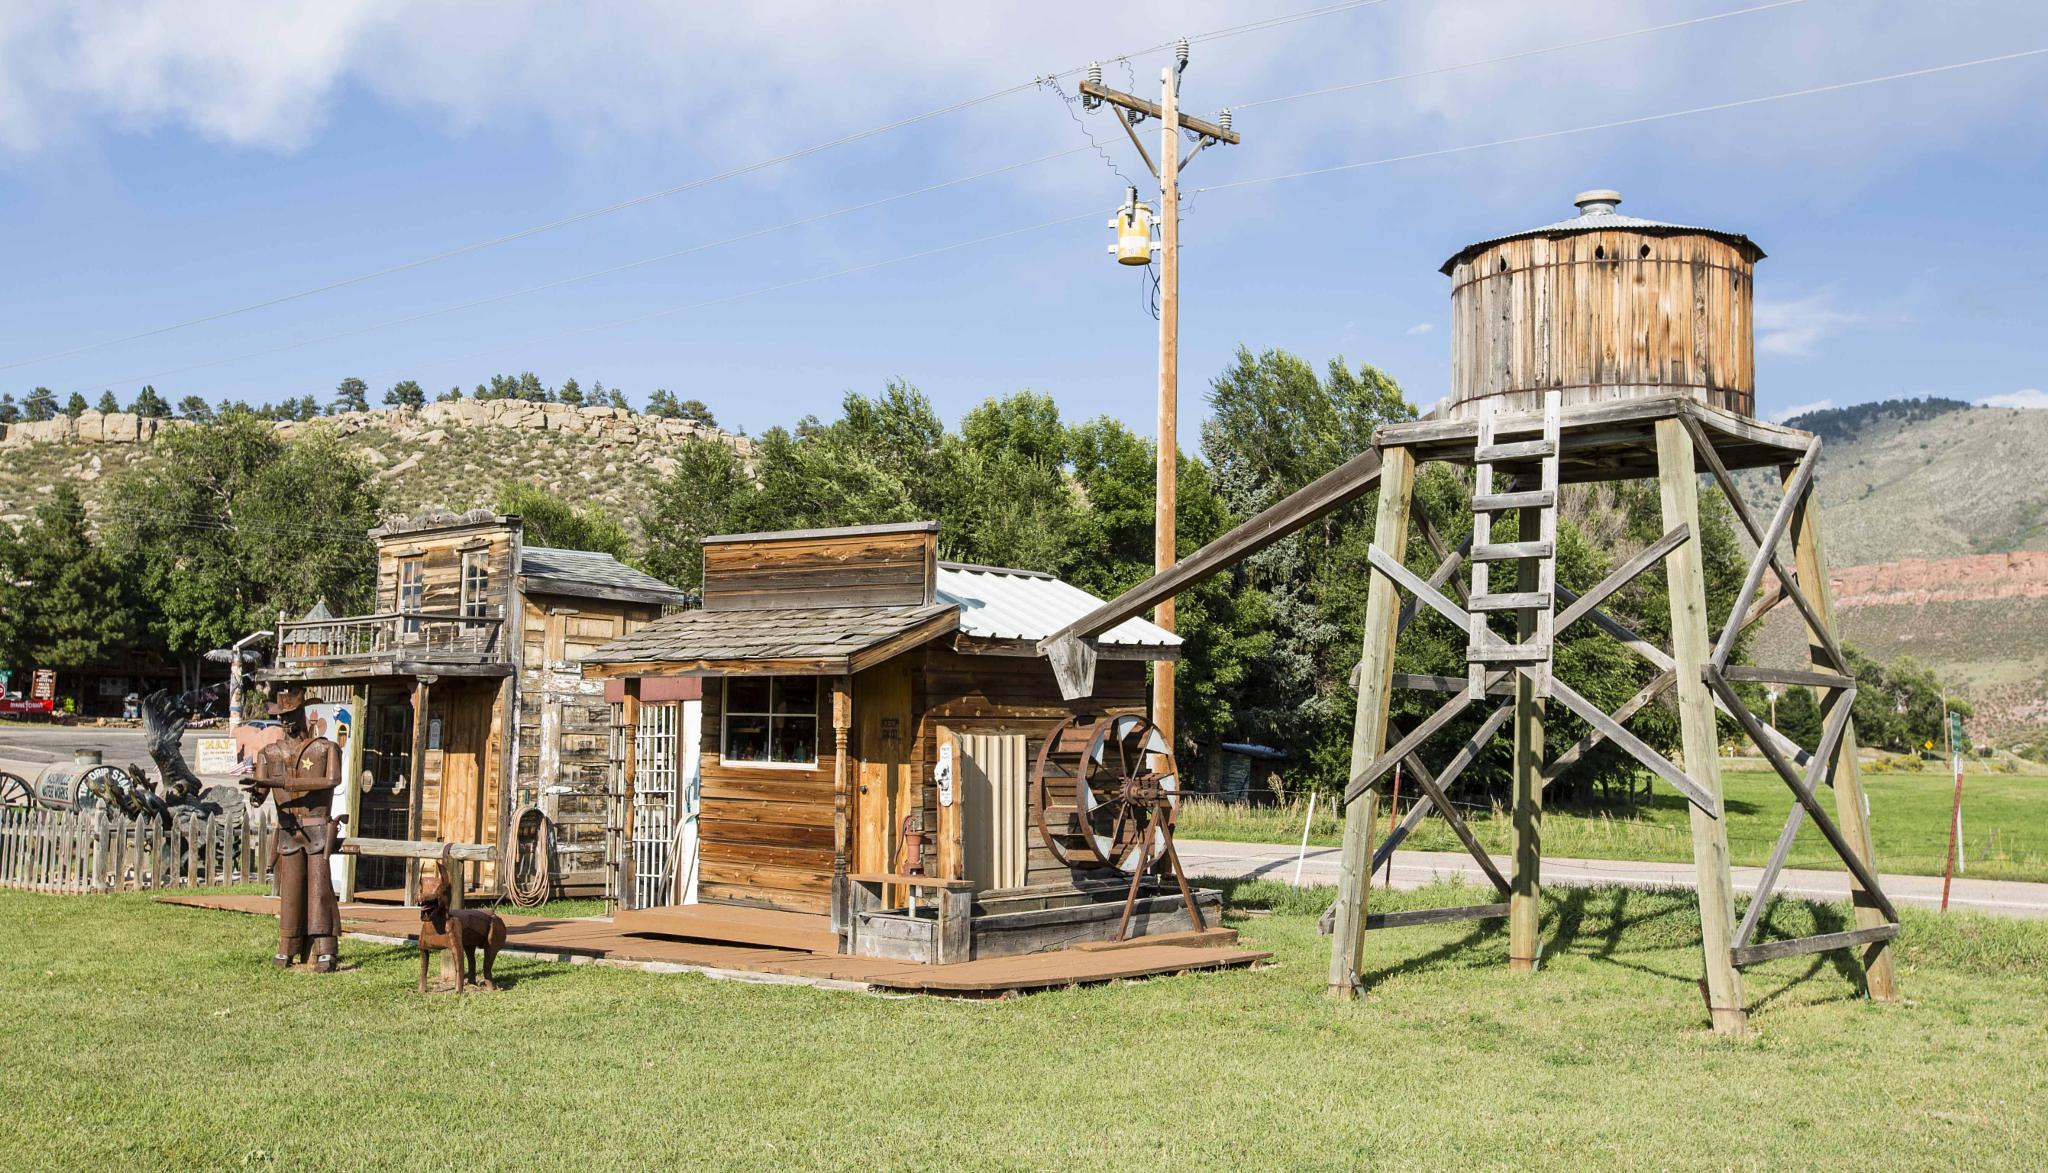 Masonville, Colorado, USA by lilian Lingwood